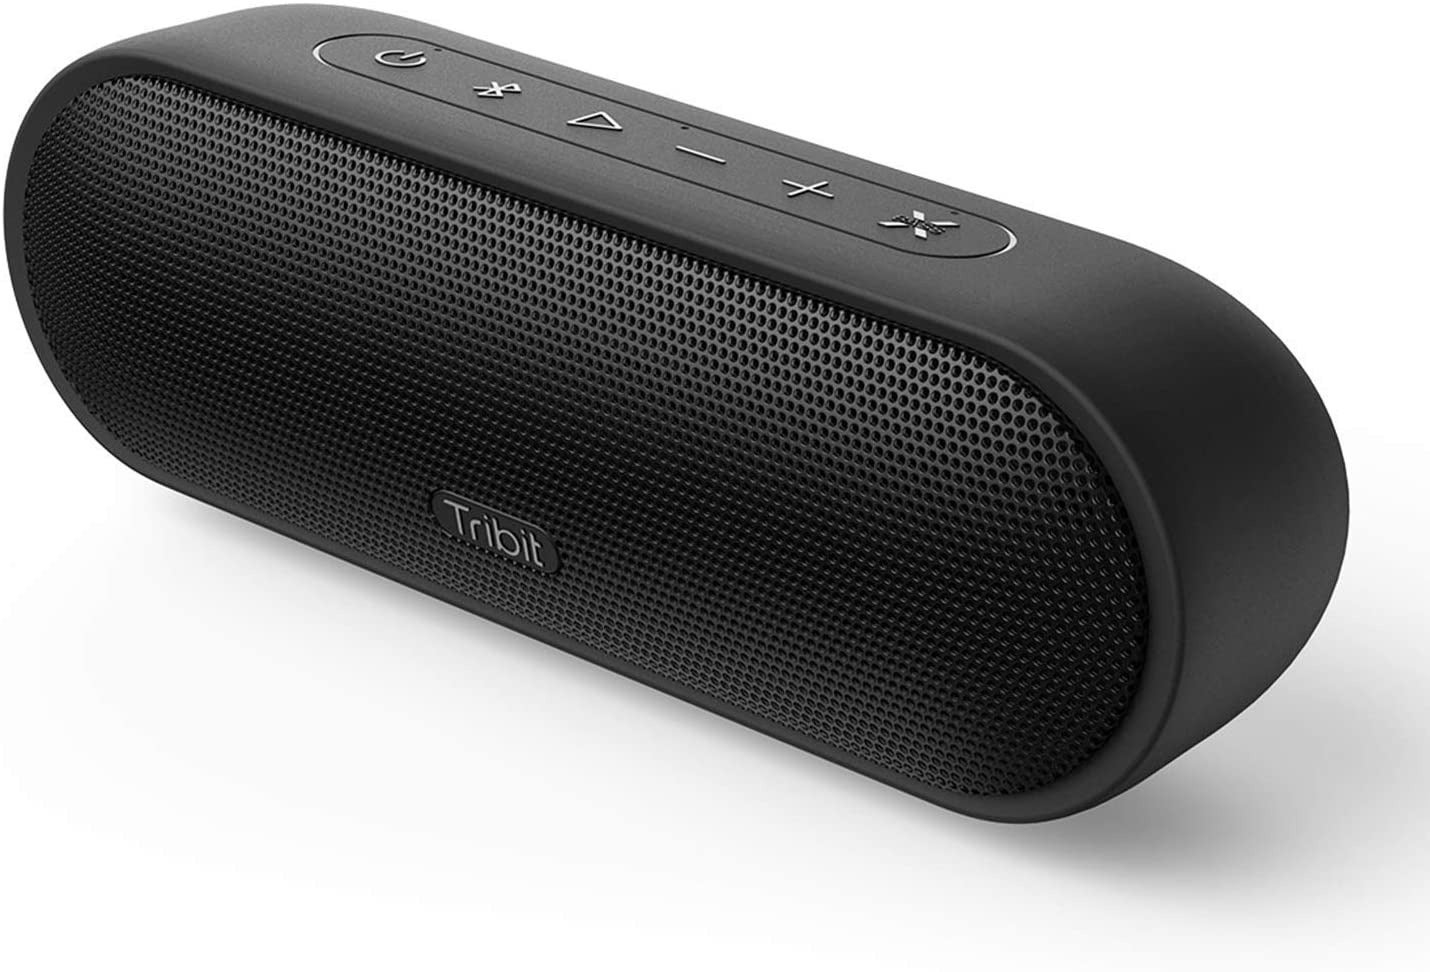 Tribit Audio - MaxSound Plus - Tragbarer Stereo-Lautsprecher - Verkabelt & Kabellos